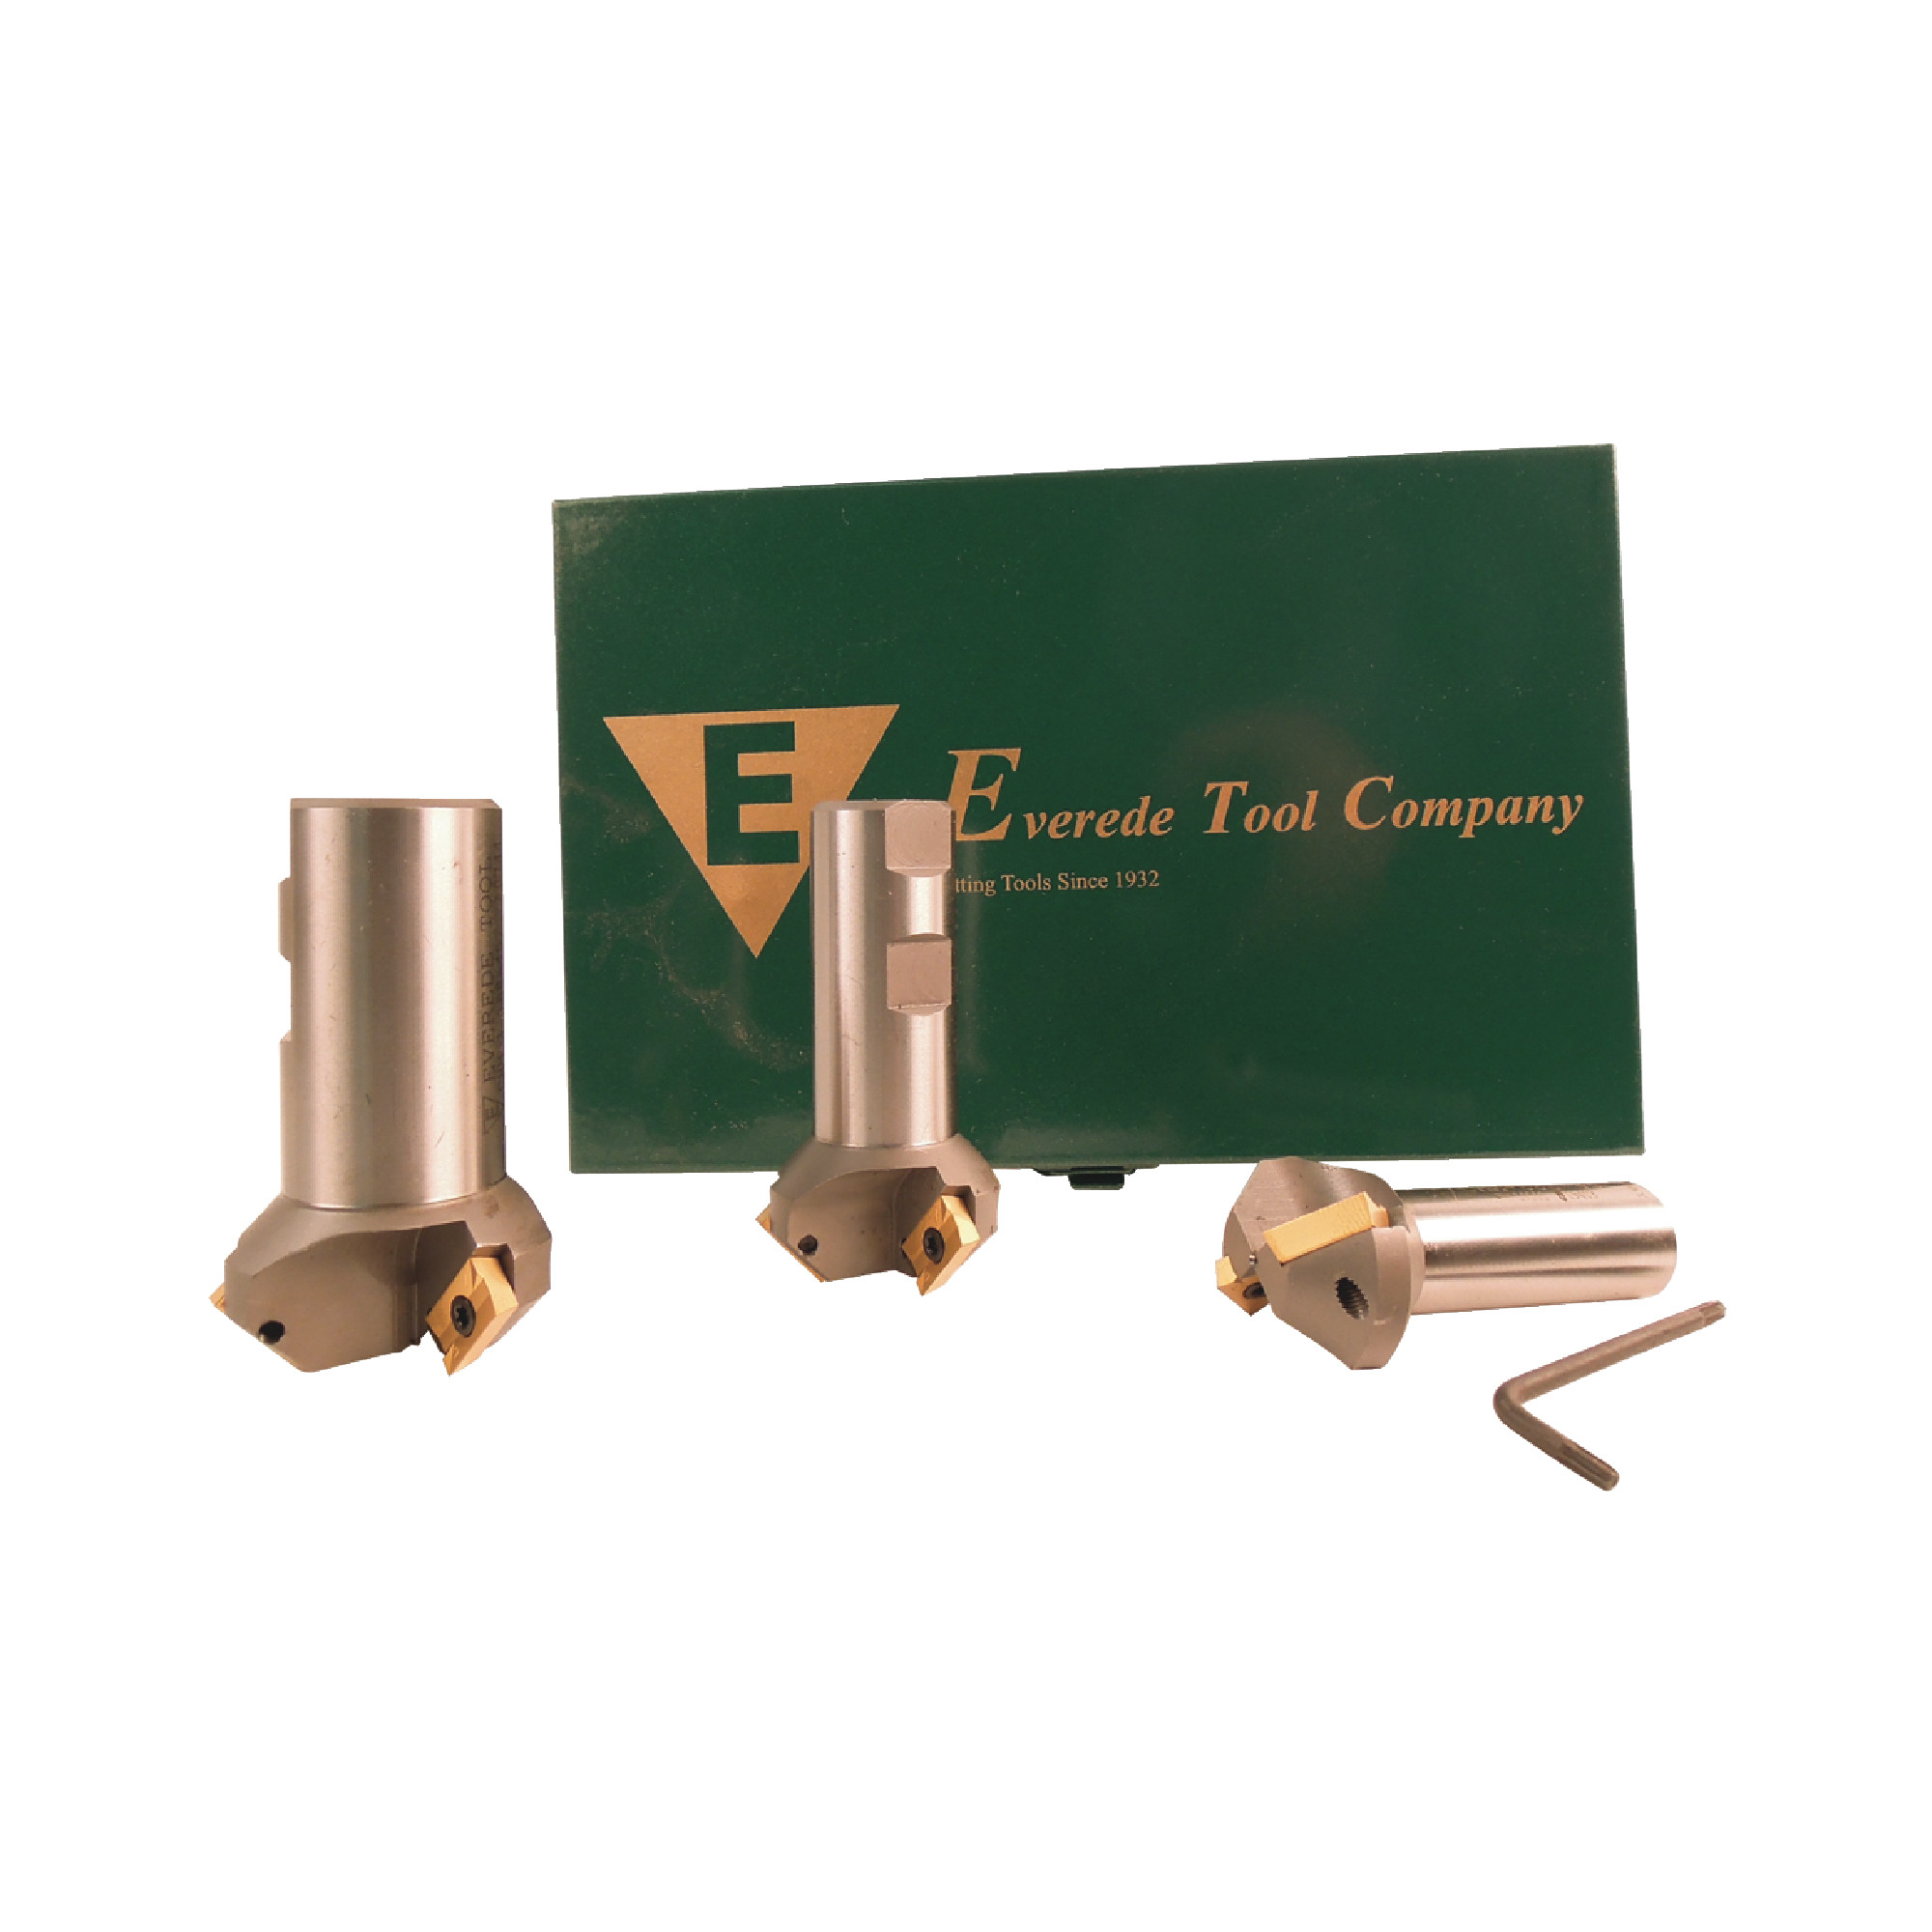 EVEREDE - SET CHM-45 - 45° 3 Piece Countersink Set/ (10) APLT347 CV6 Coated Inserts